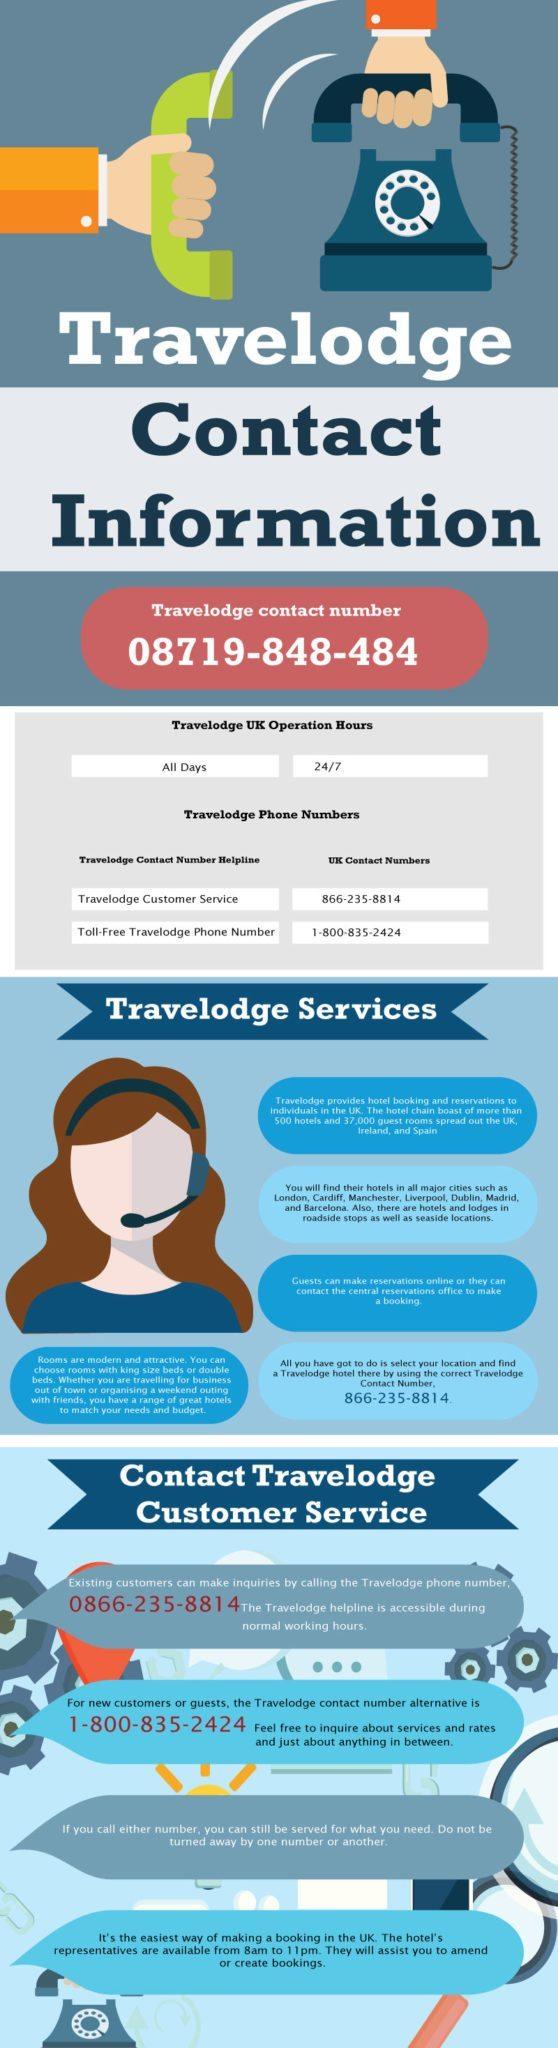 Travelodge Customer Service